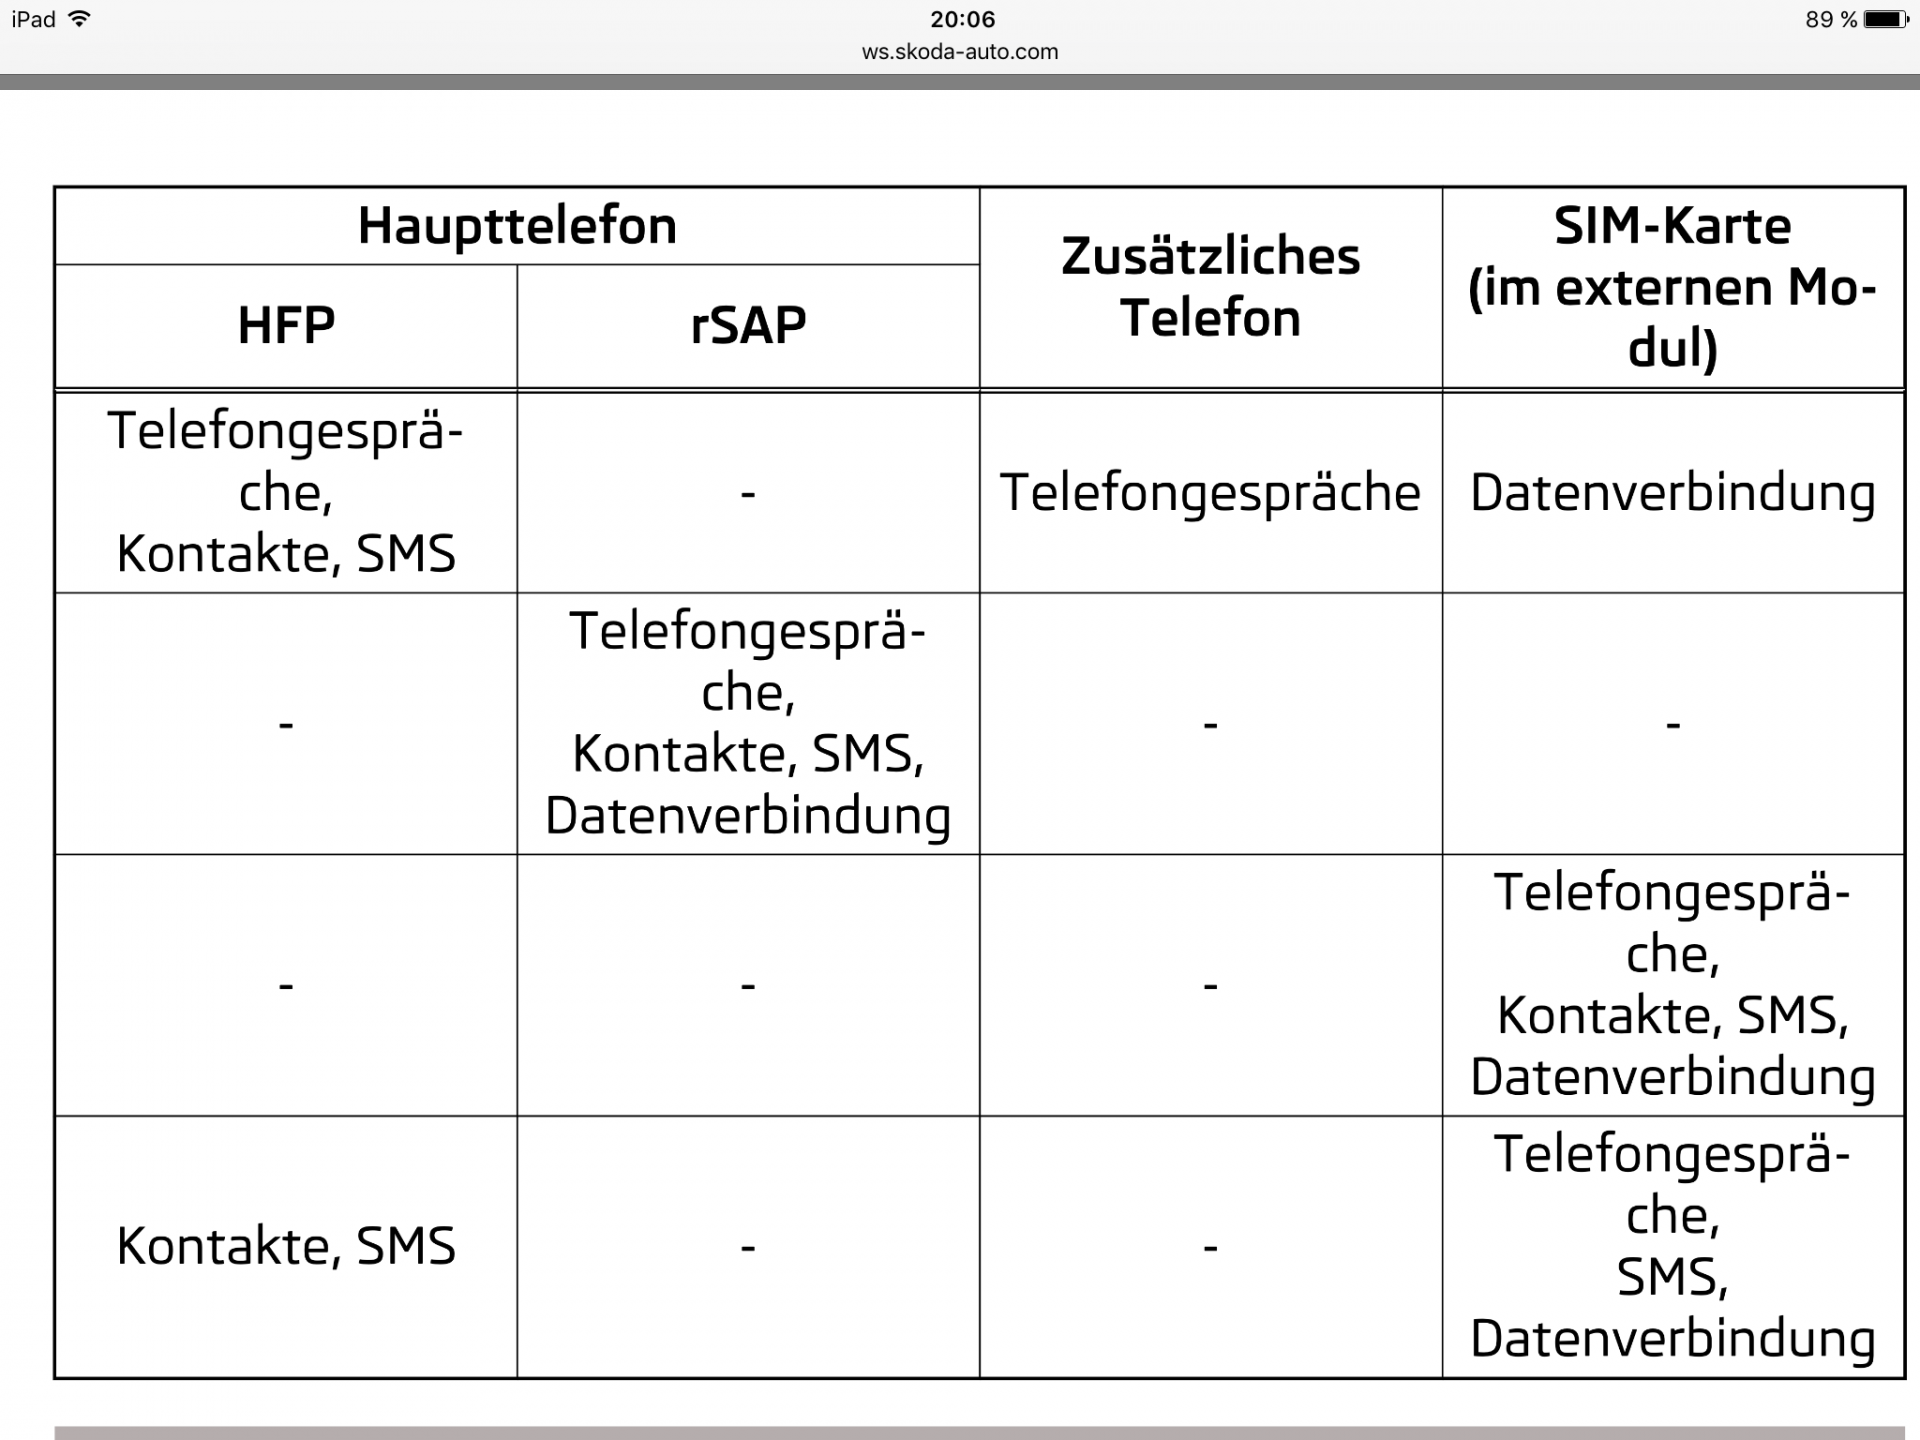 Großzügig Verkabelung Für Autoscom Ideen - Elektrische Schaltplan ...